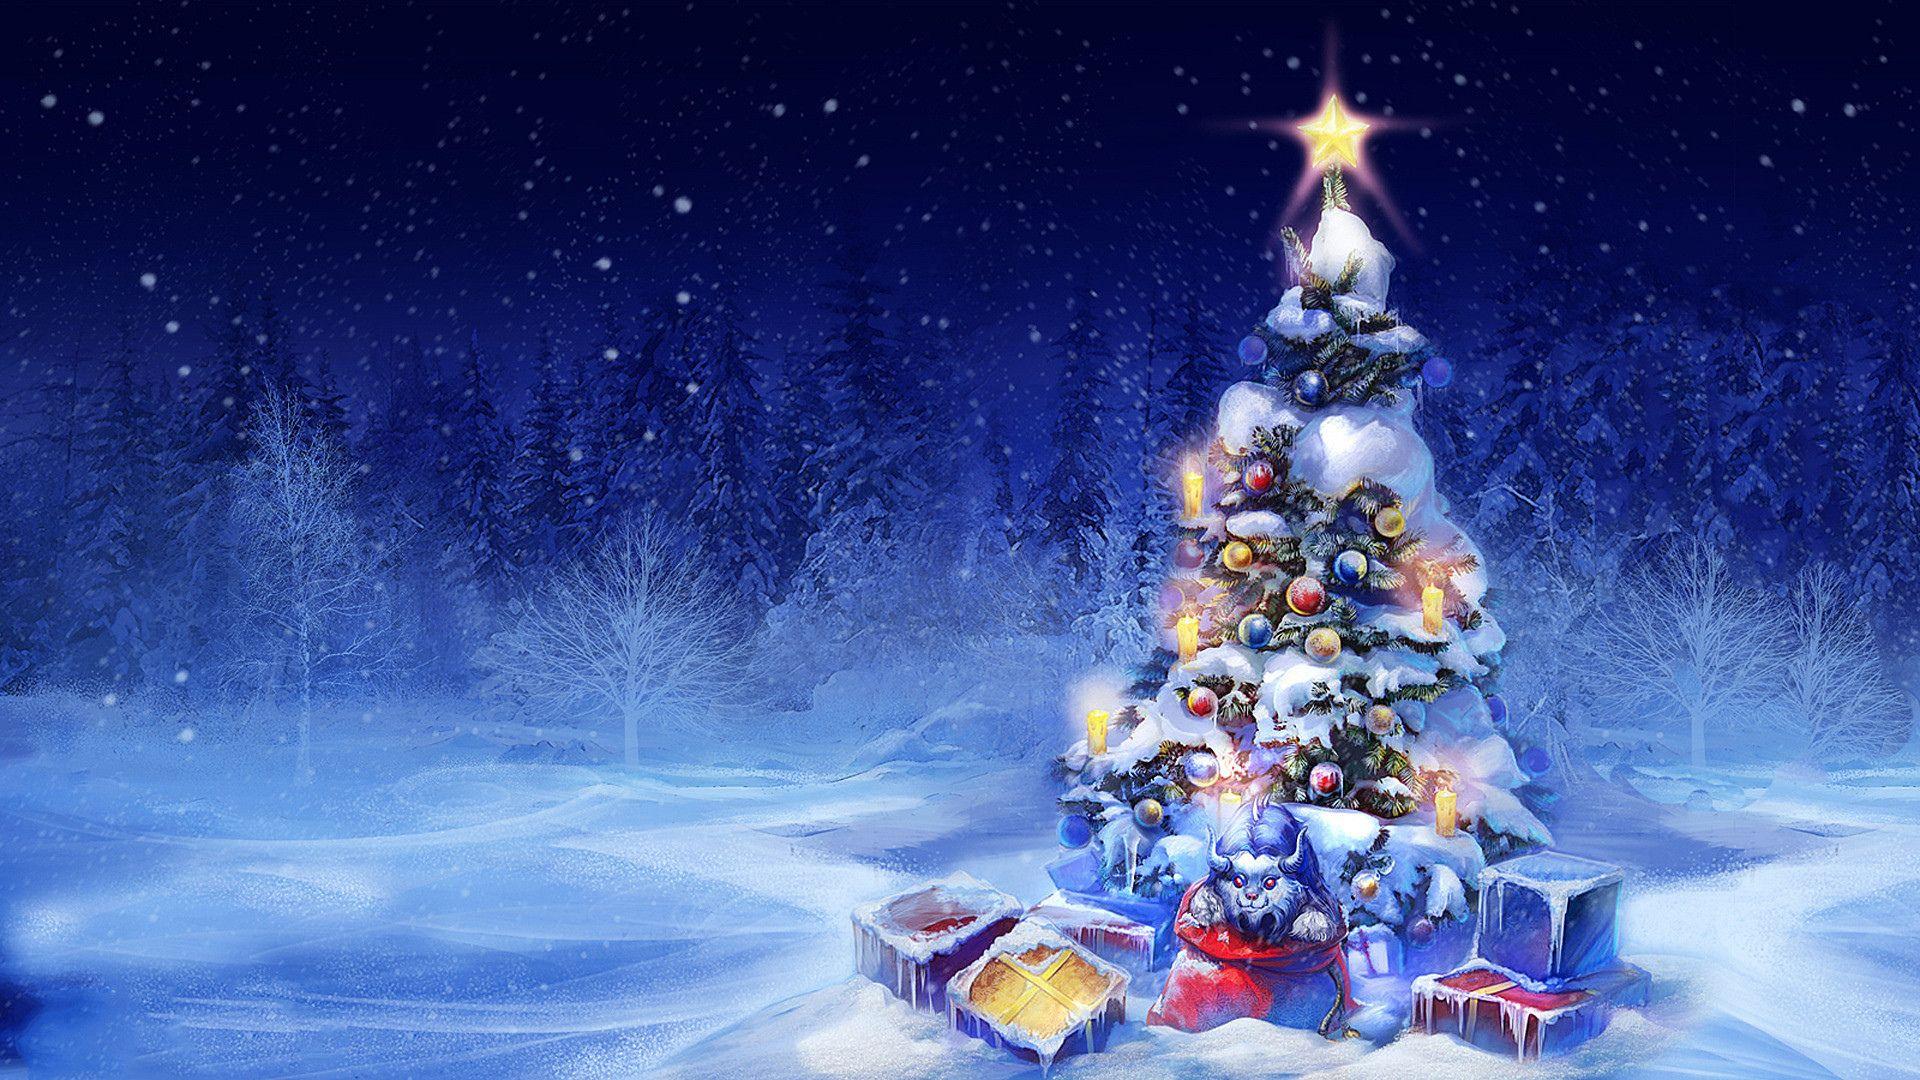 Fond D écran Vacances De Noël: Vacances Noël Vacances Hiver Snow Christmas Tree Fond D